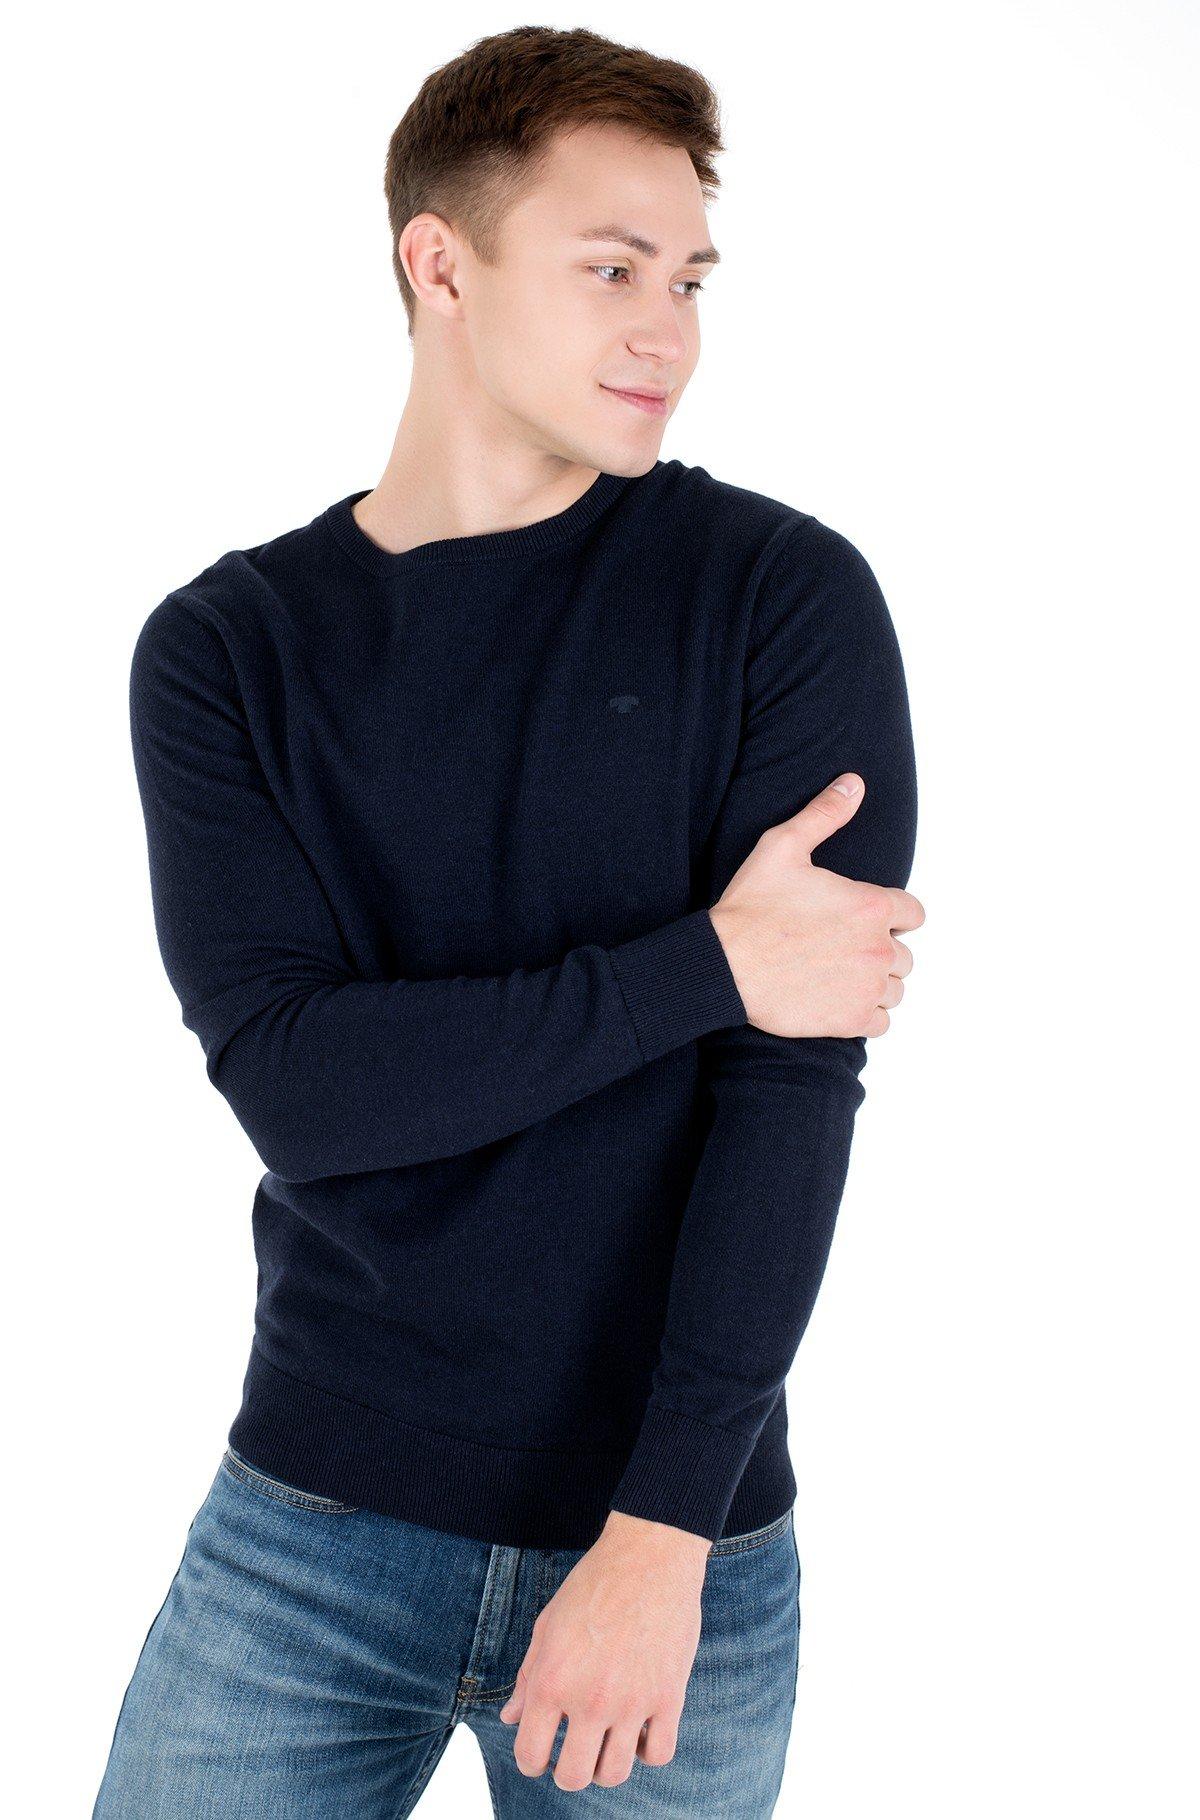 Sweater 1012819-full-1